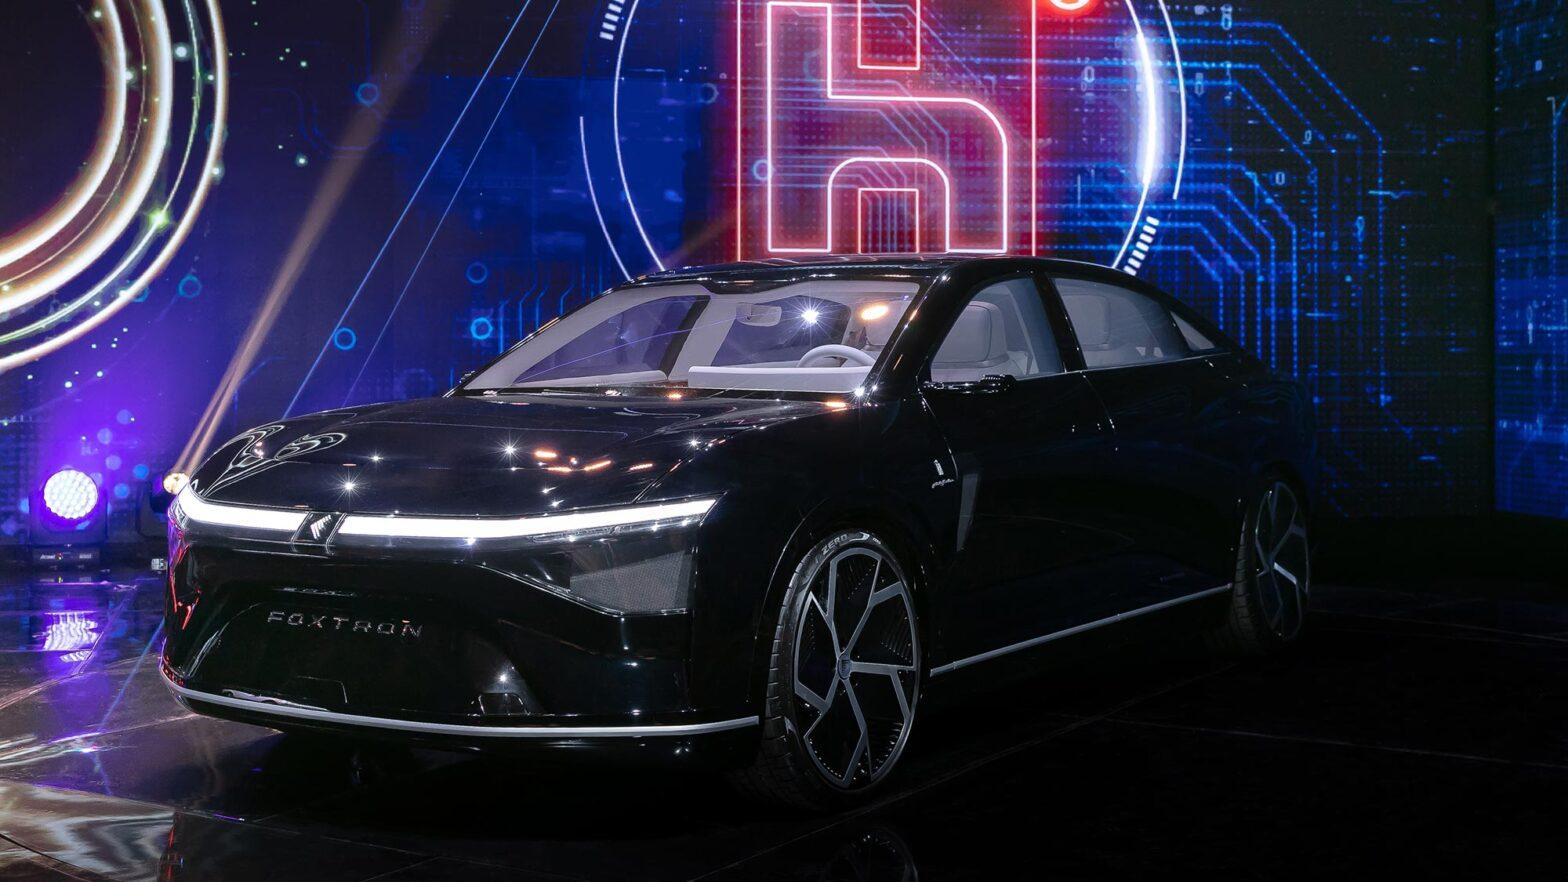 Foxtron Electric Vehicles by Foxconn Unveiled